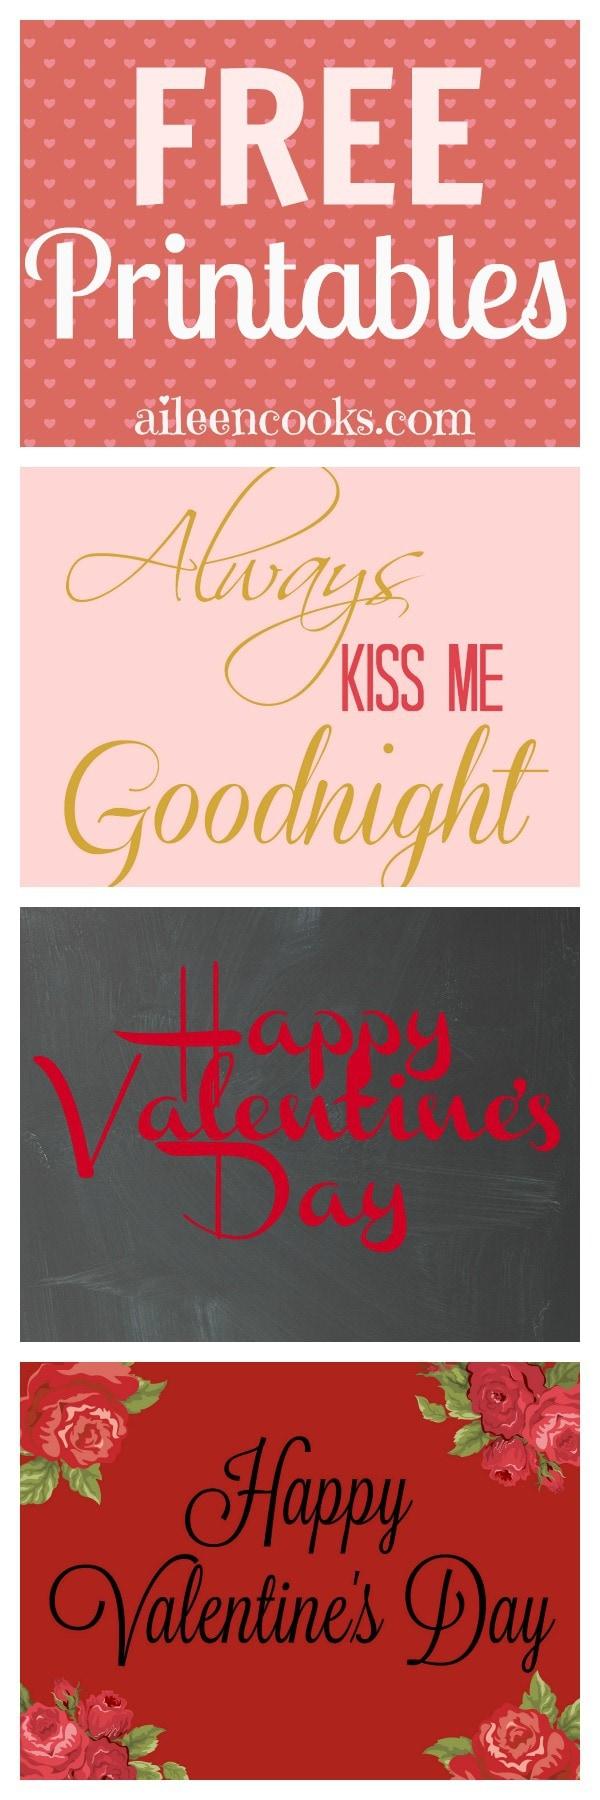 always kiss me goodnight free printable aileen cooks